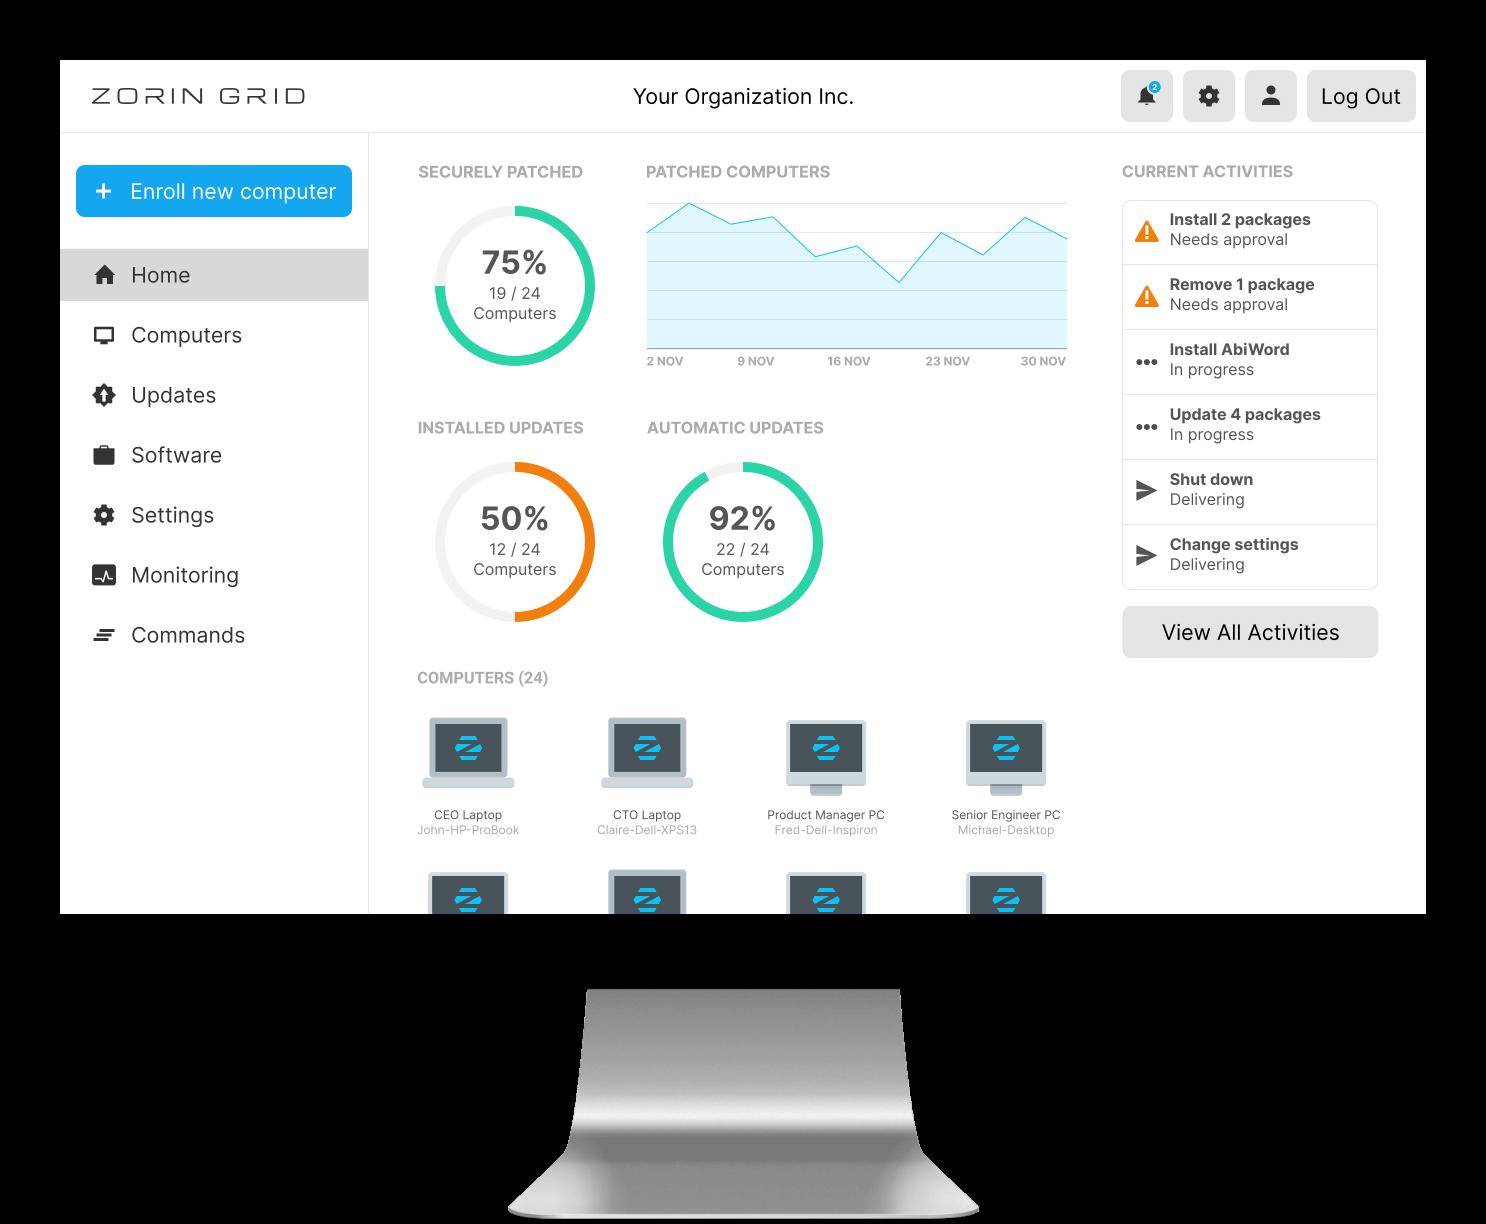 Zorin Grid dashboard